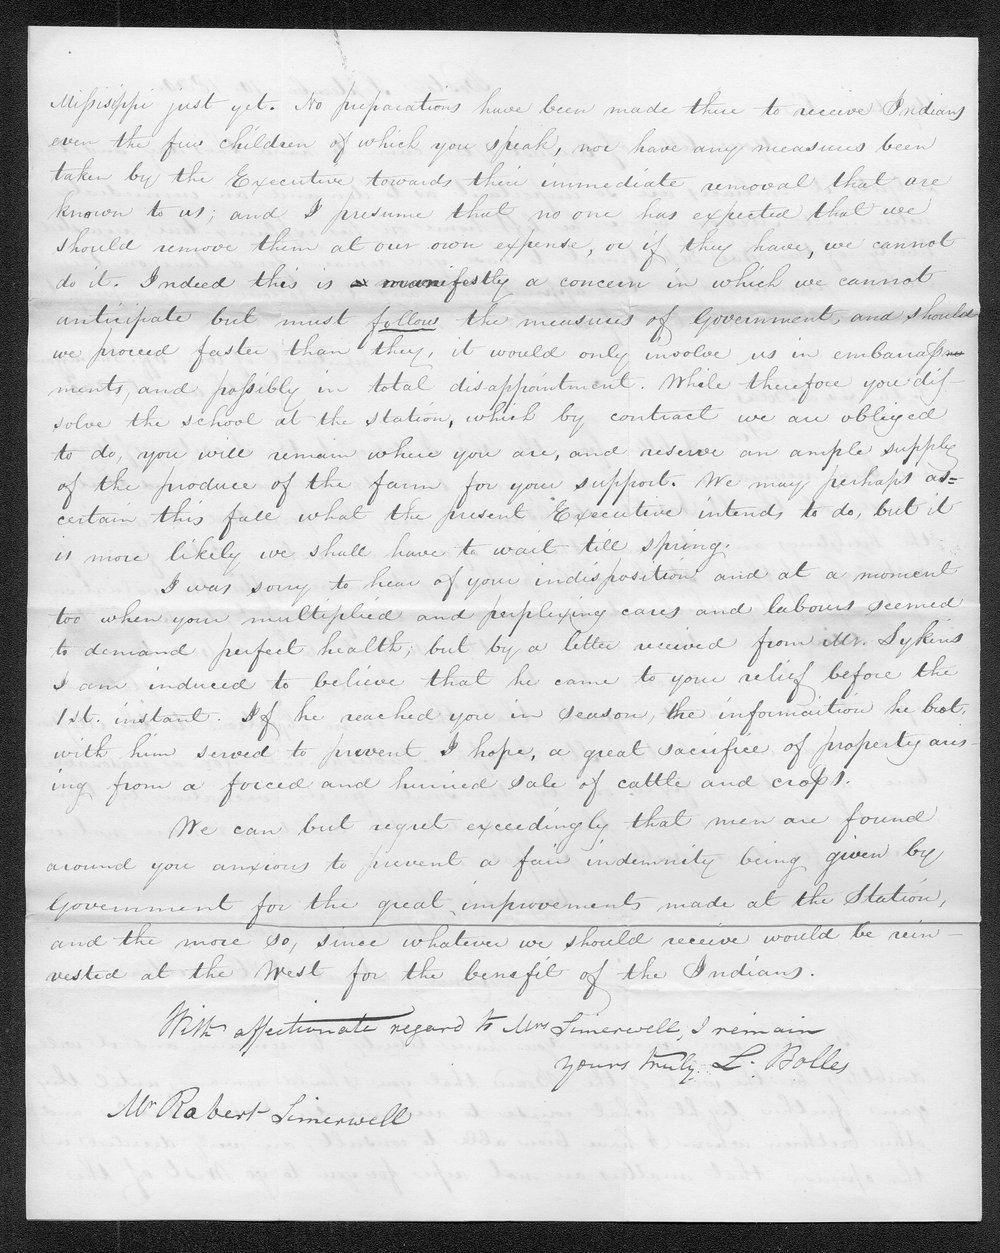 Samuel S. Hamilton to Robert Simerwell - 2